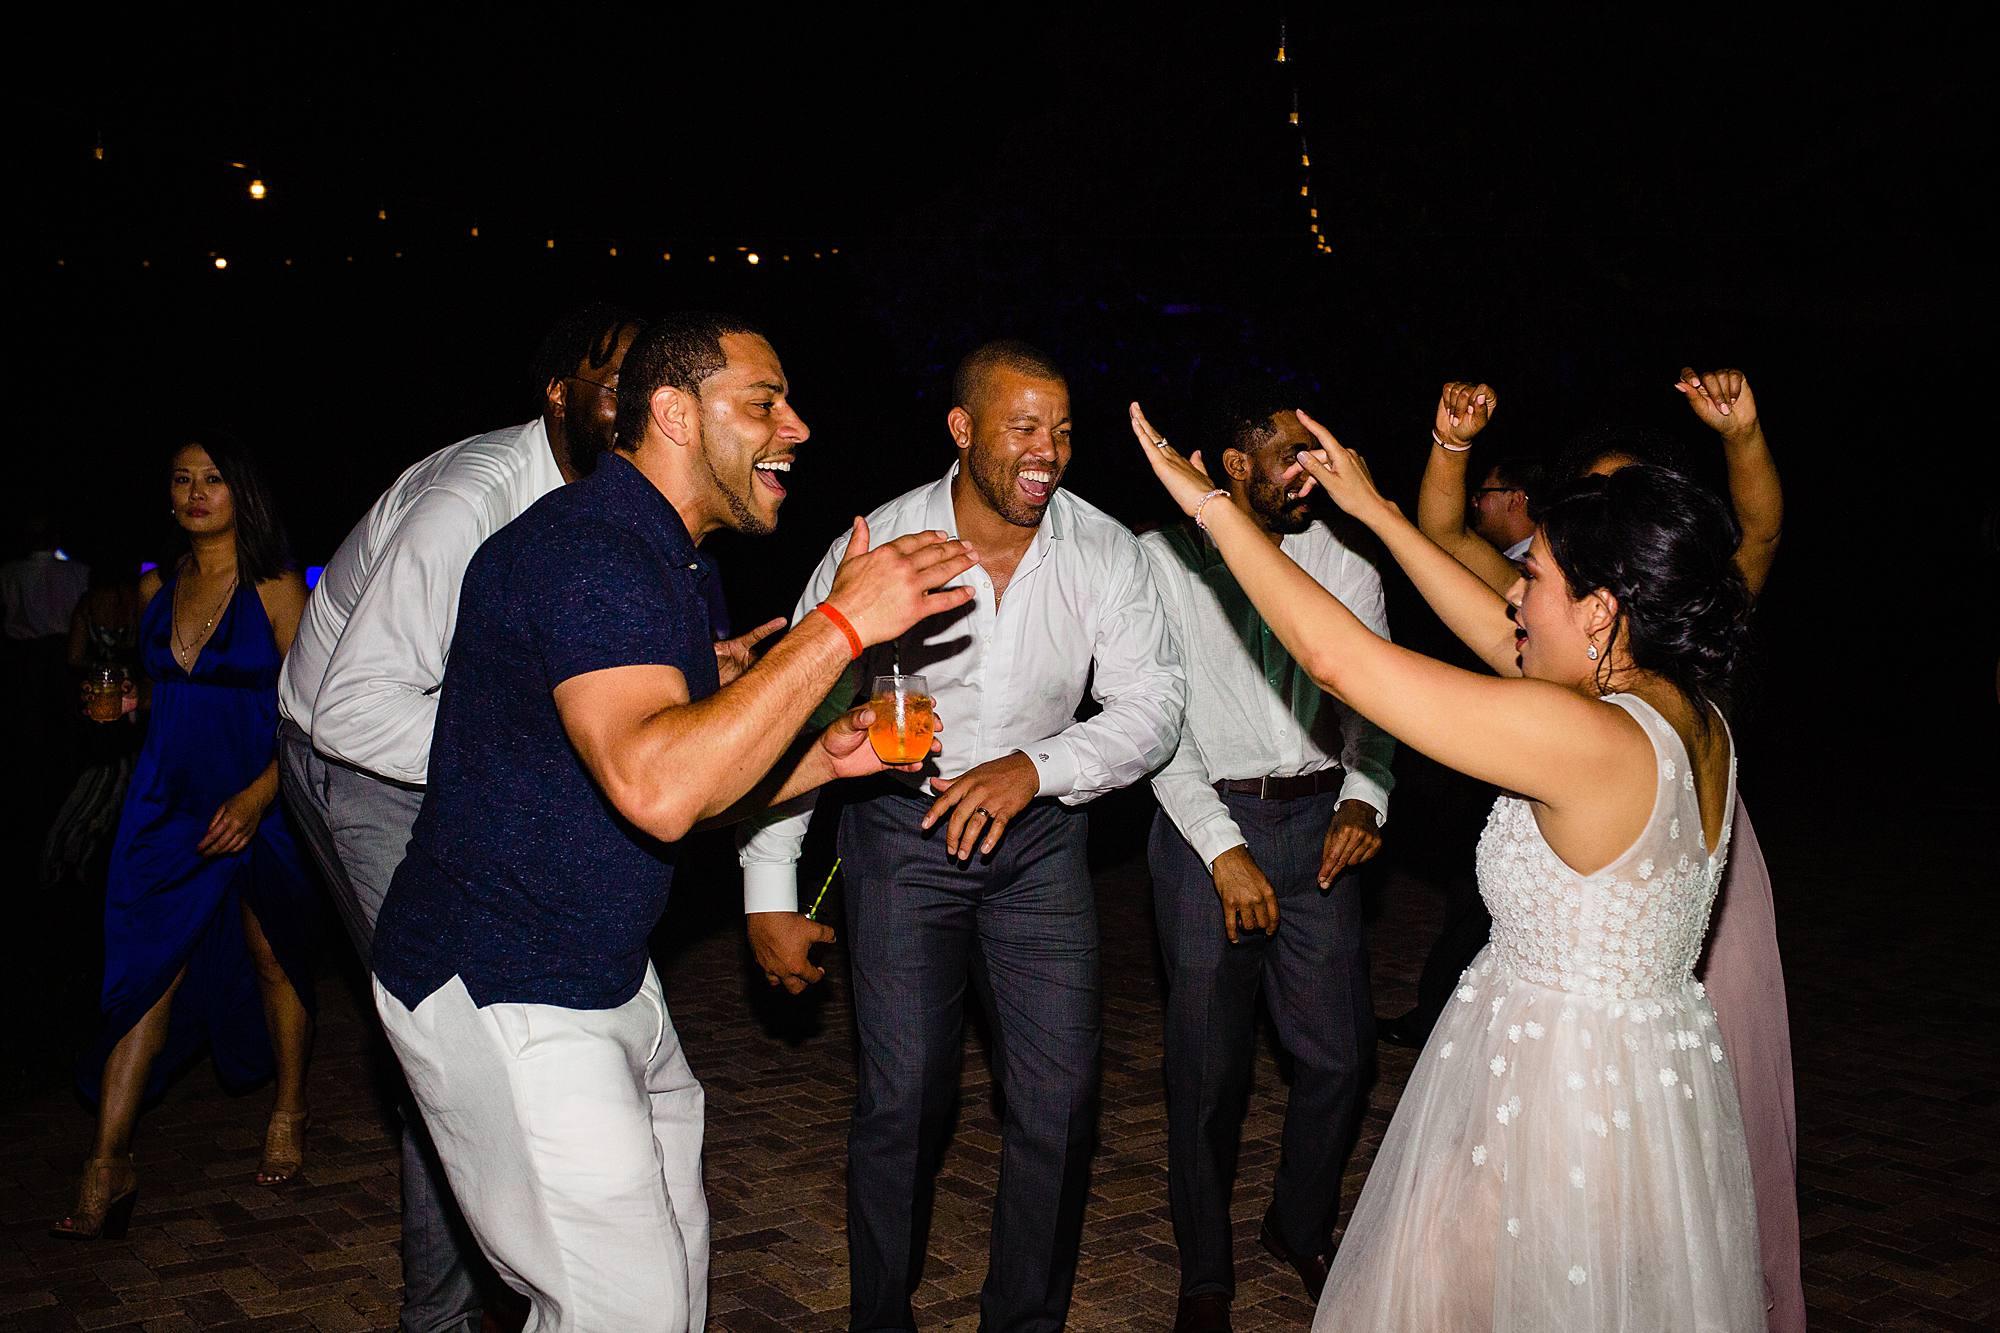 bride dancing with guests at destination wedding at olowalu plantation house